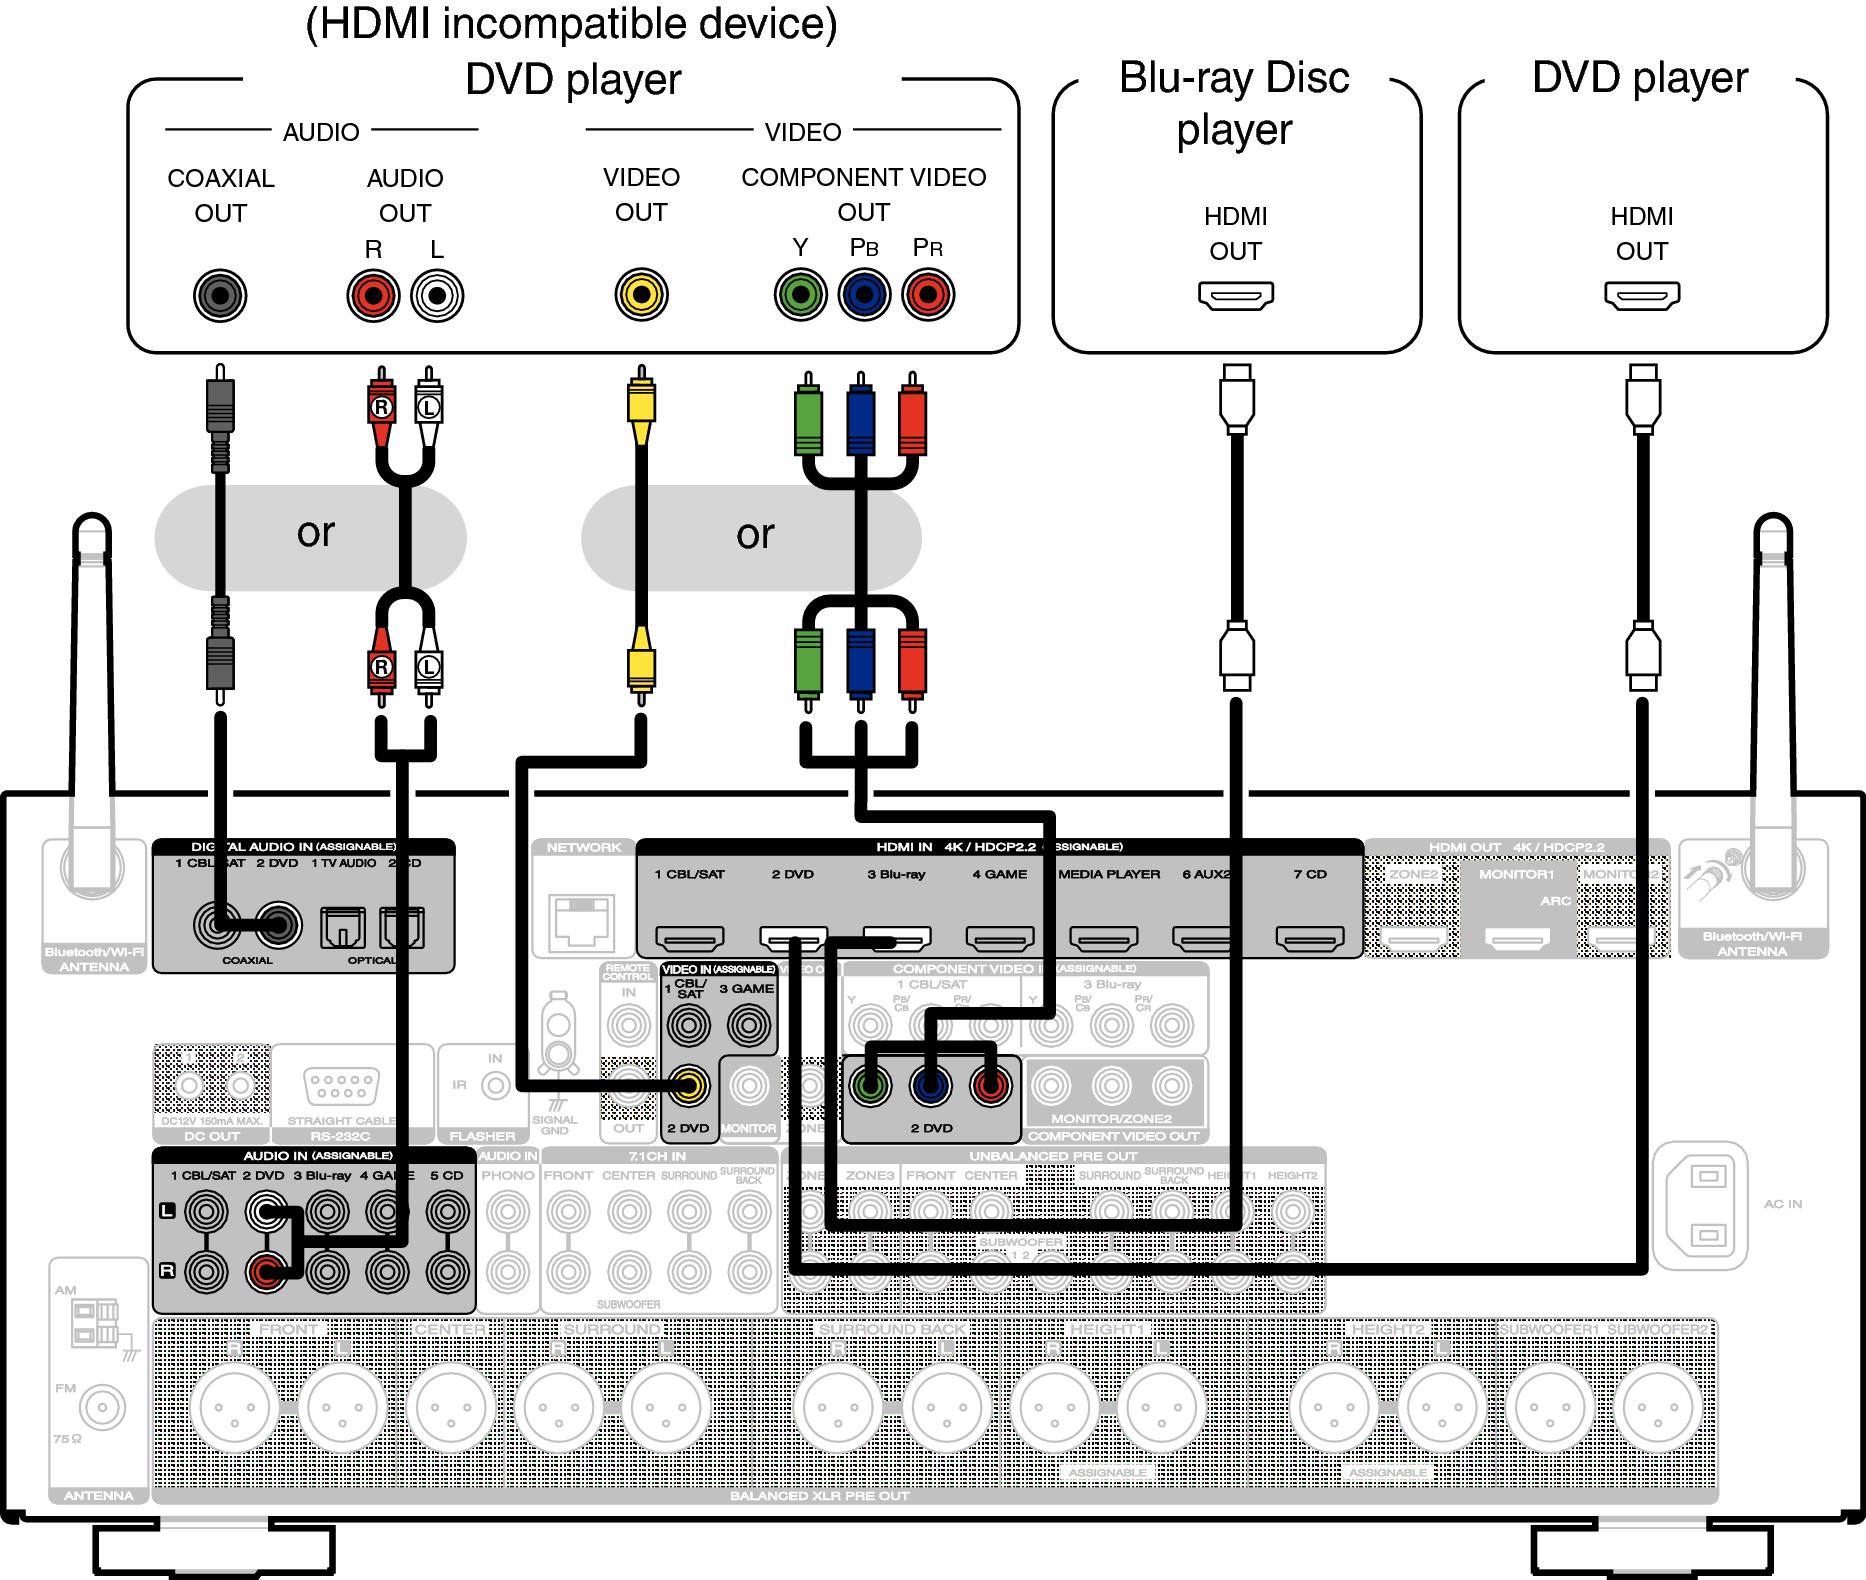 Wiring Diagram For Visteon Dvd Monitor - Wiring Diagram •